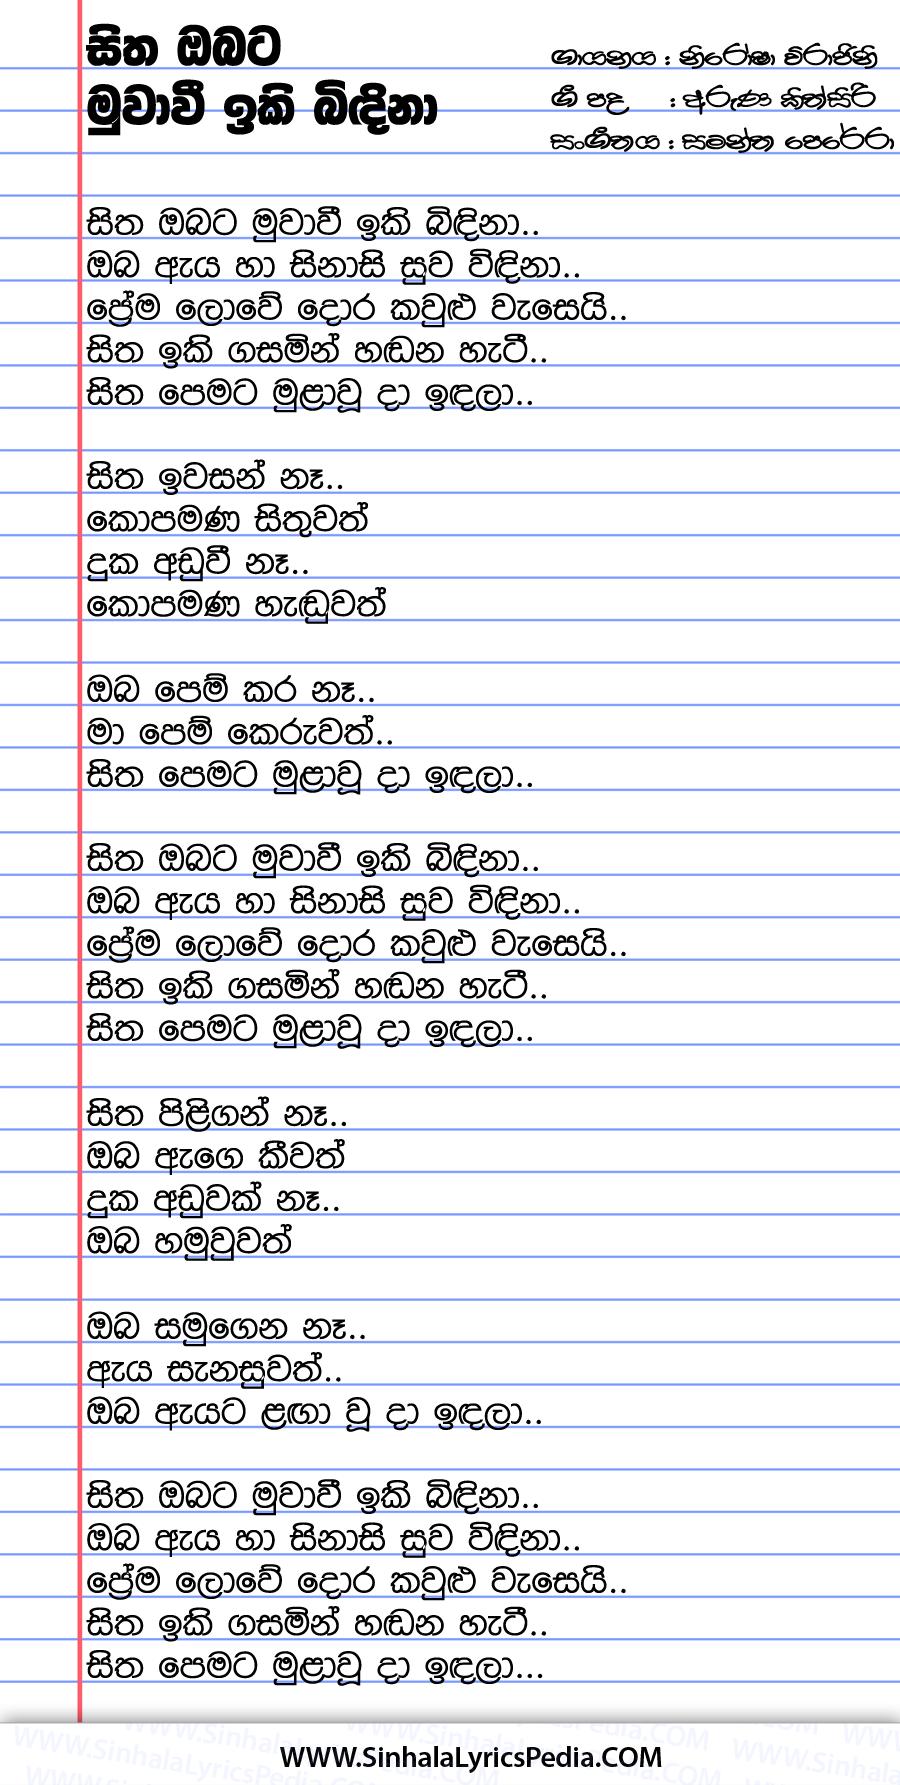 Sitha Obata Muwa Wee Ikibidina Song Lyrics